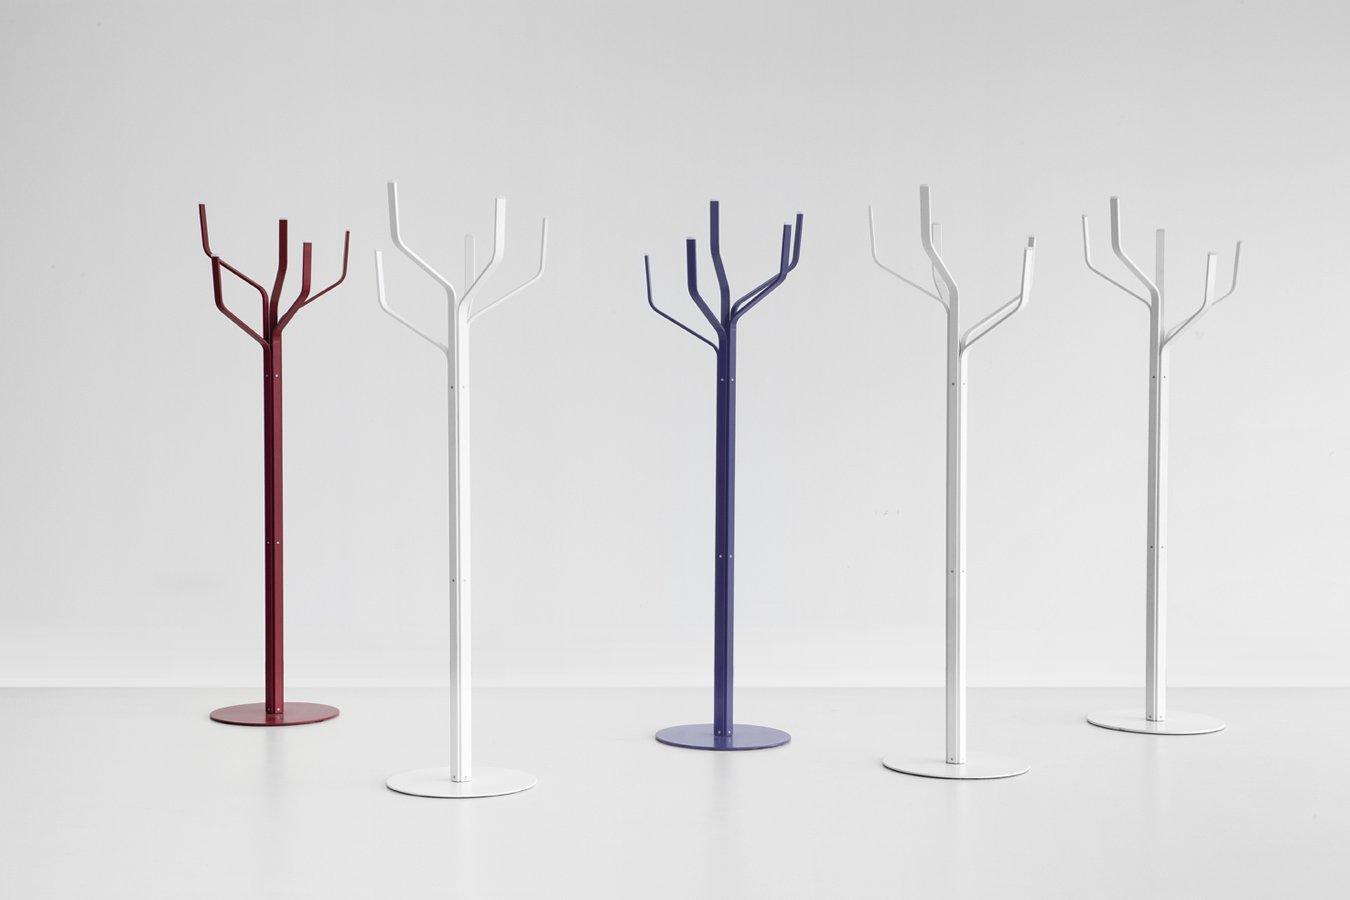 Albero Coat Hanger accessory from lapalma, designed by Fabio Bortolani